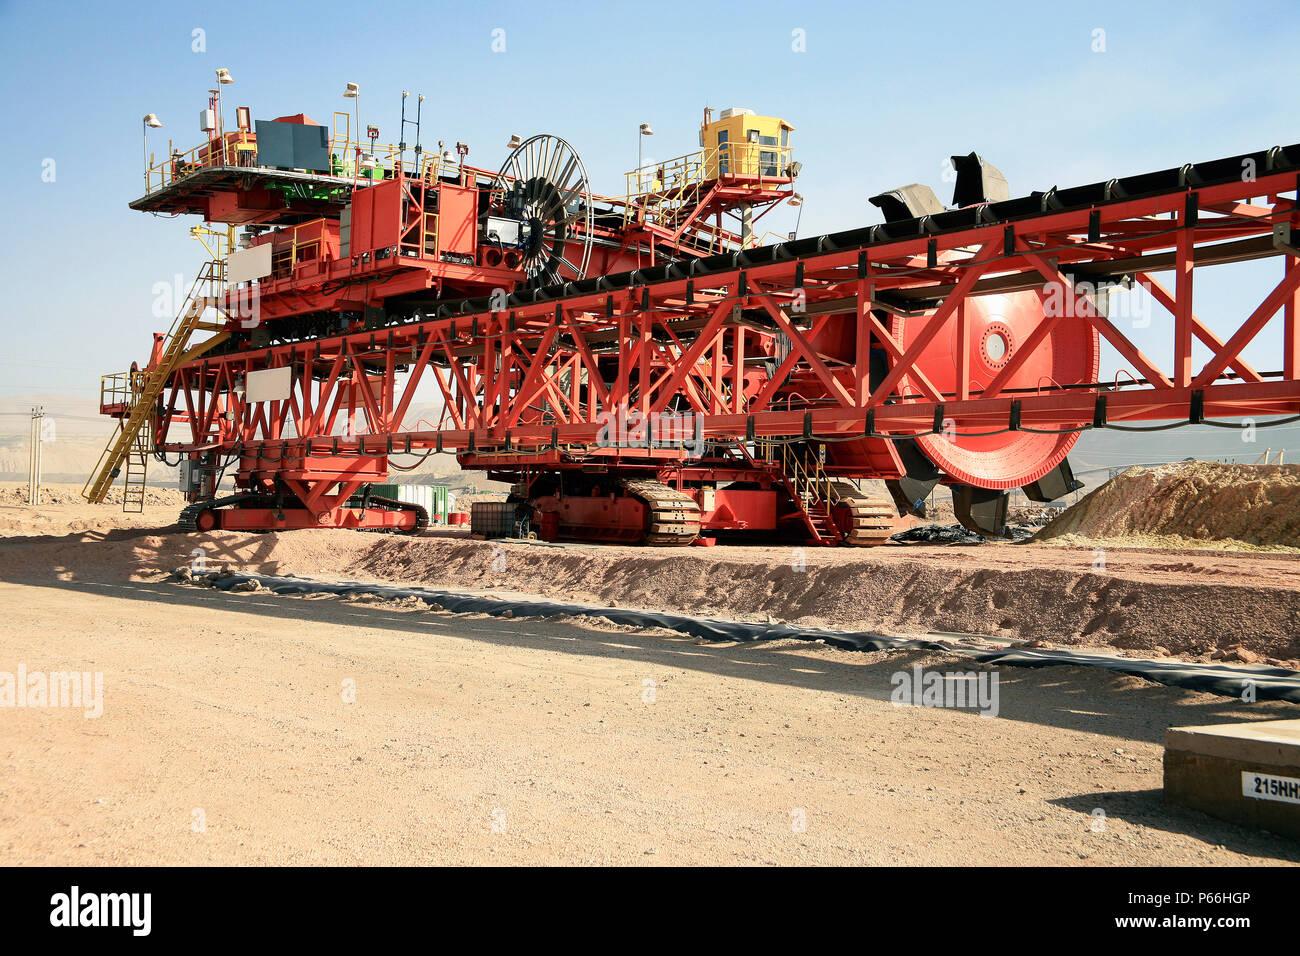 Bucket Wheel Excavator In Chuquicamata Chile Stock Photo Alamy